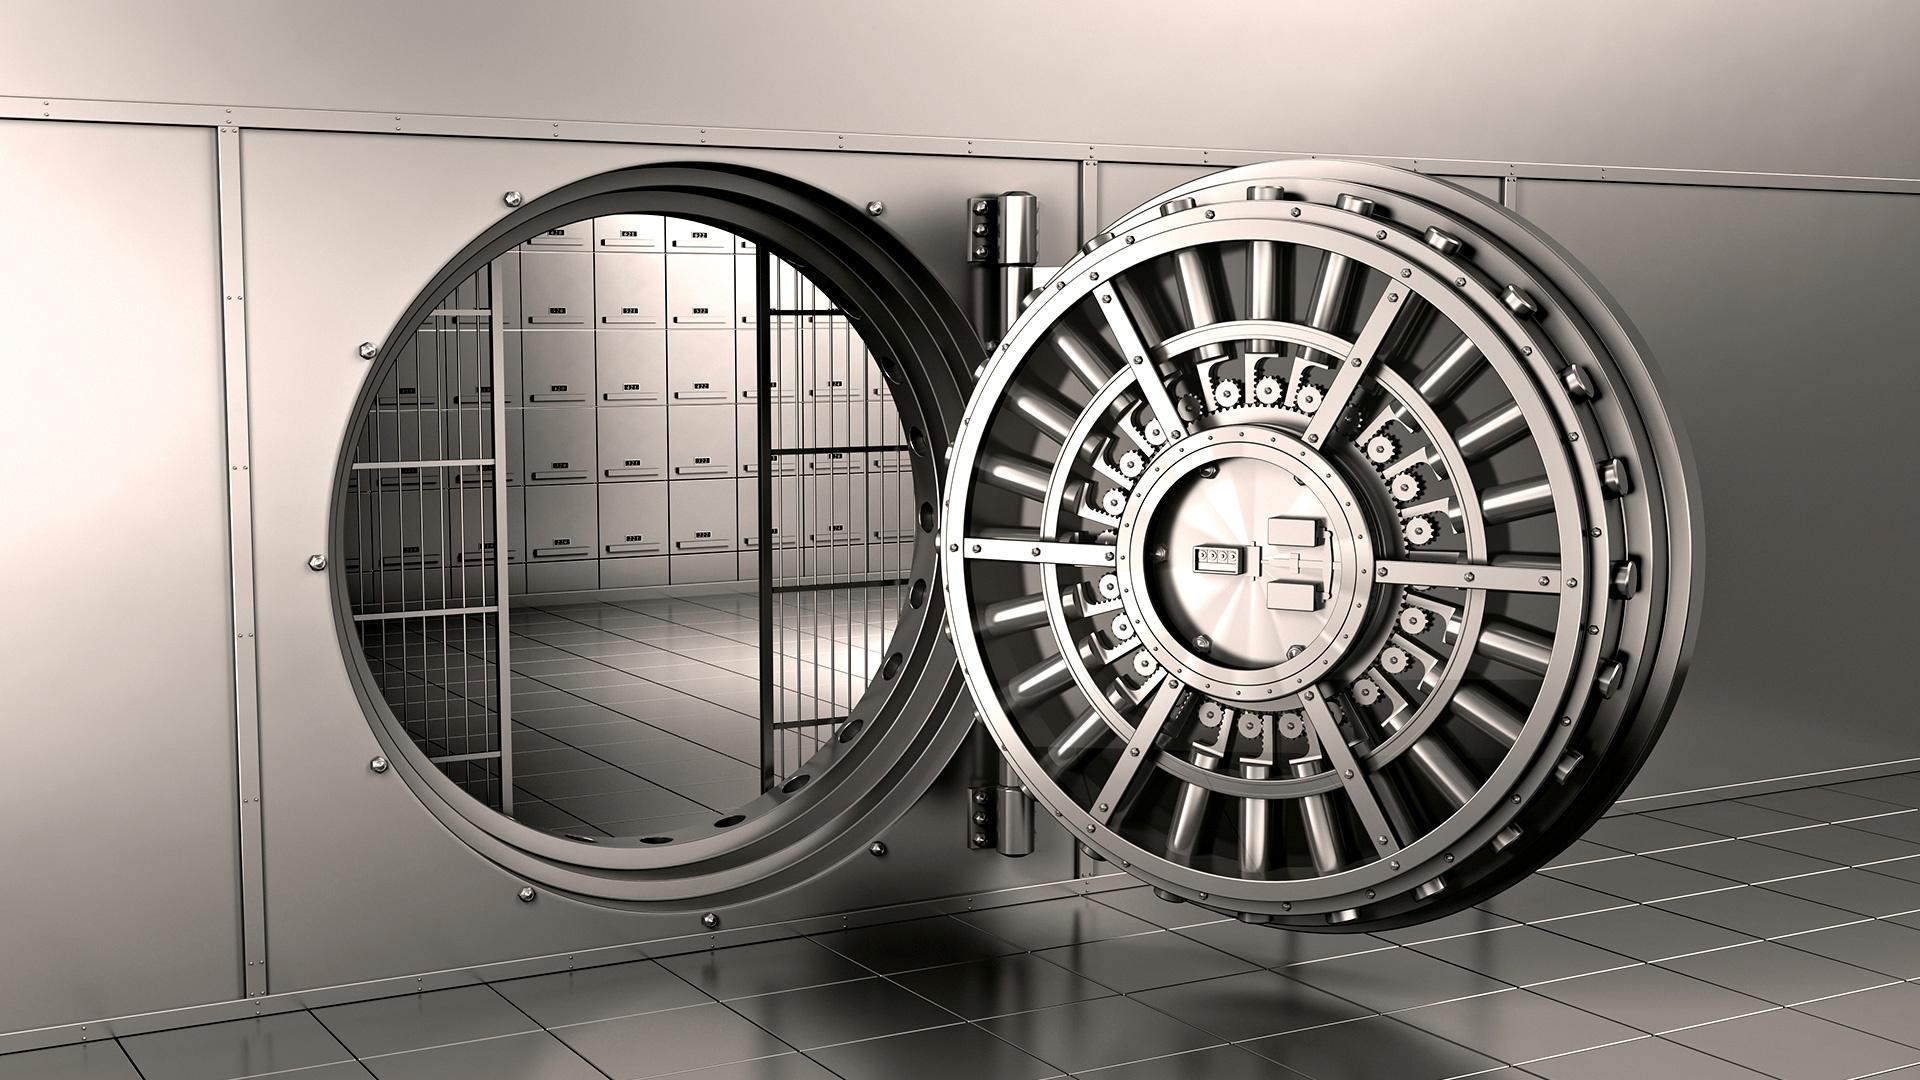 украинских банков